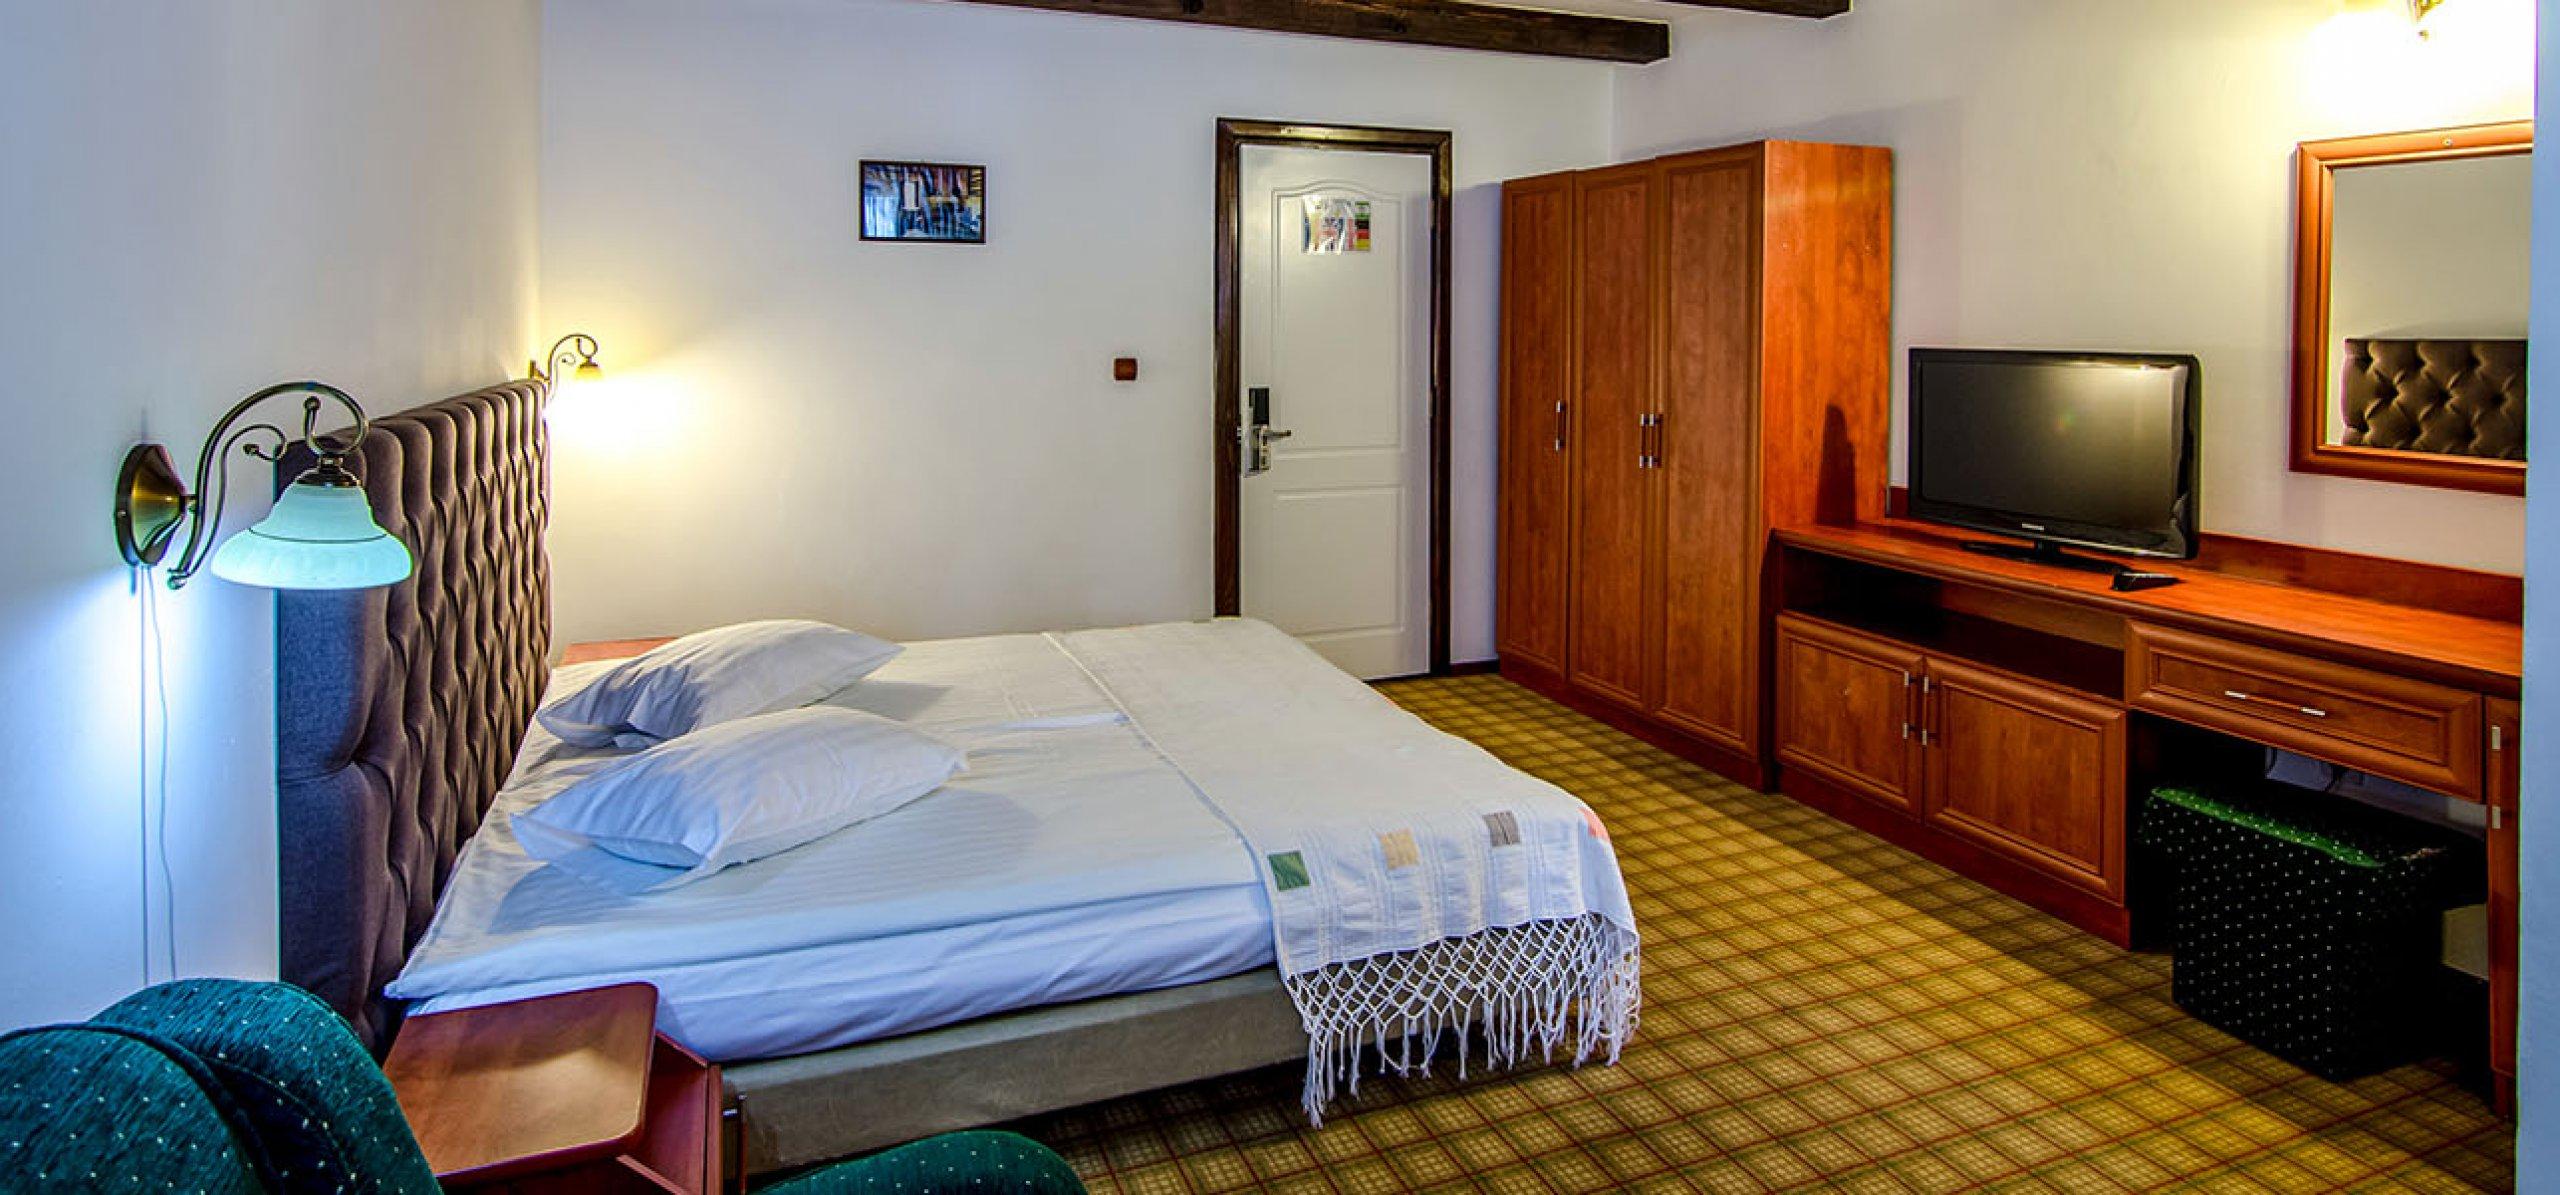 camera0dubla-matrimoniala-luminoasa-hotel-gradistea-hoteluri-moeciu